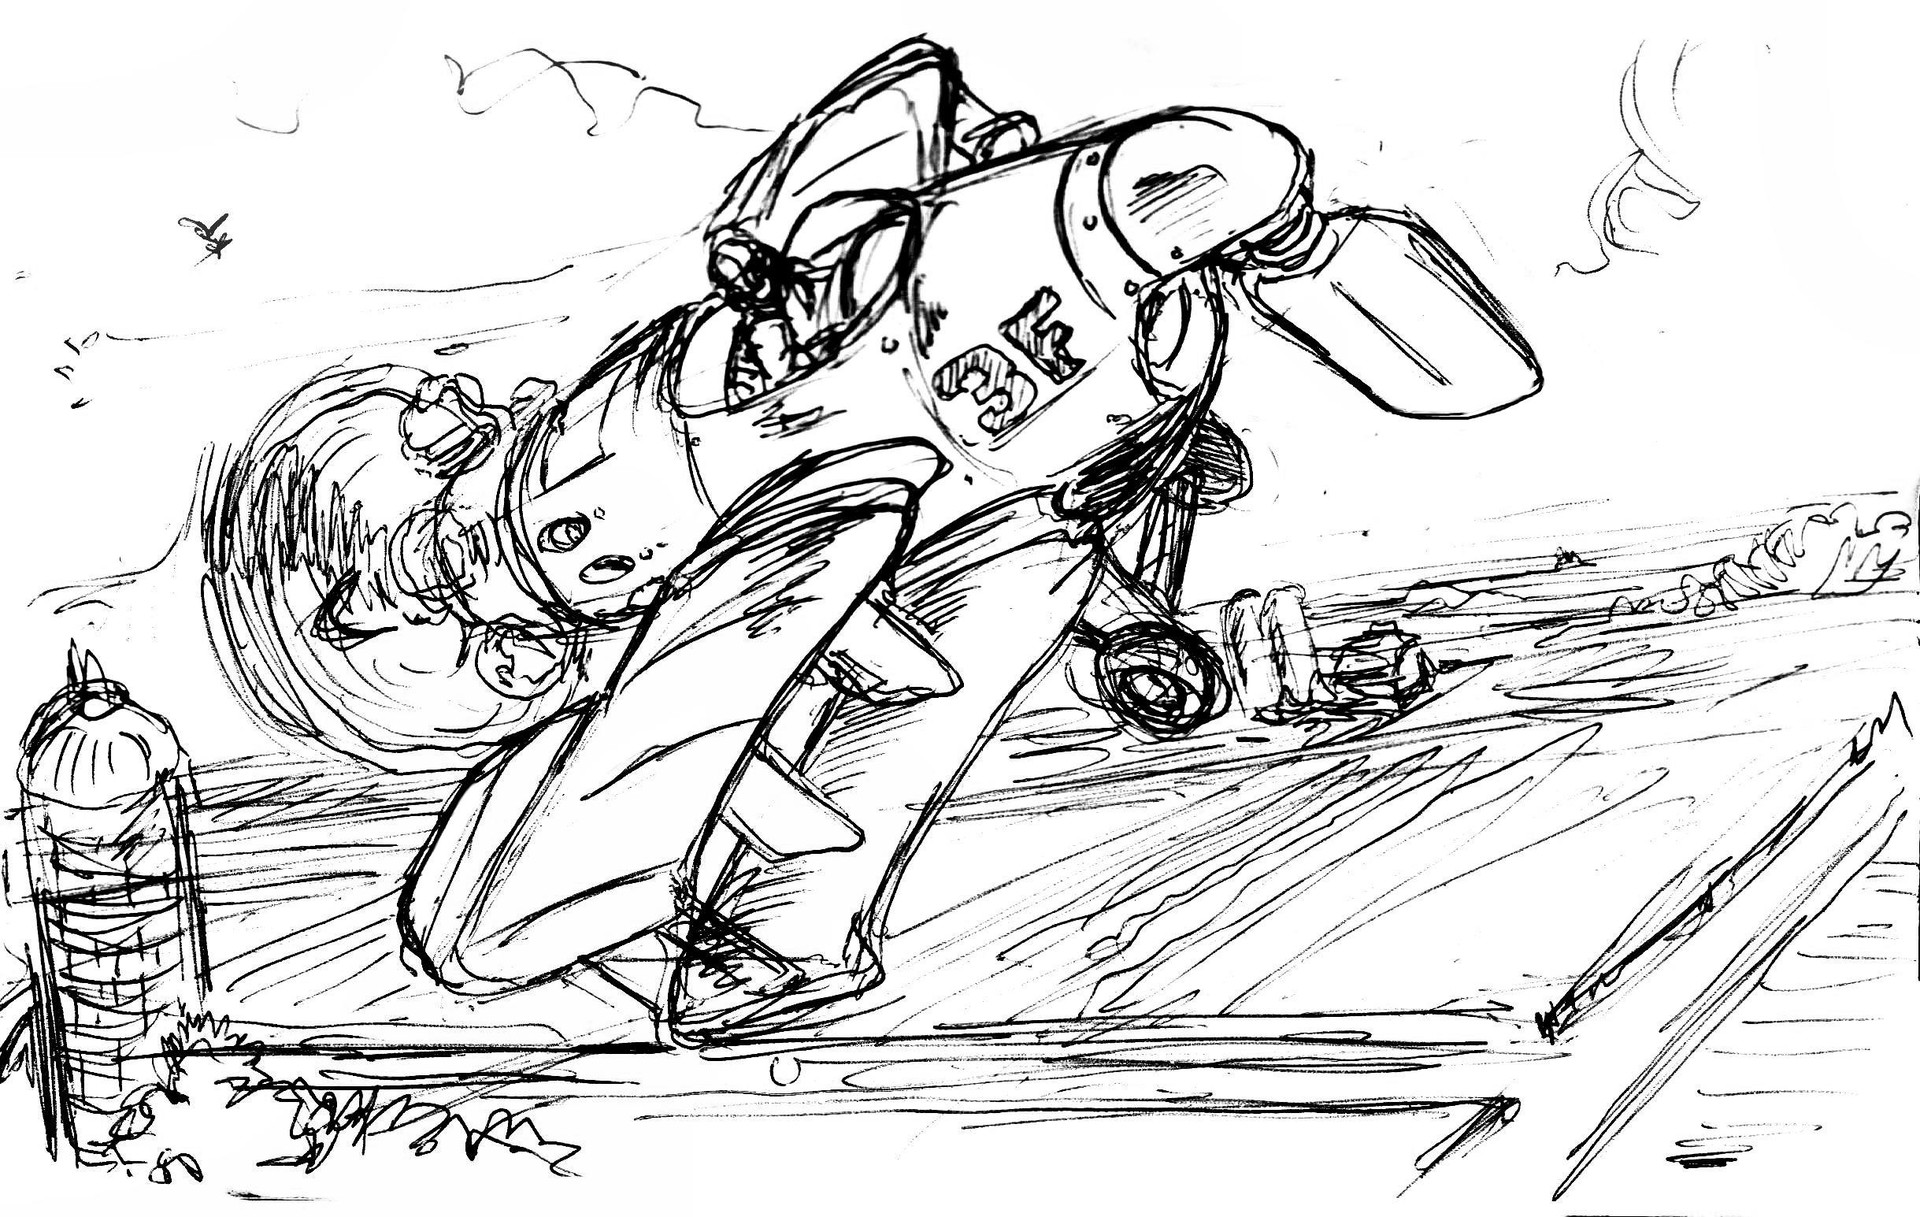 Vincent bryant mics sketches 014